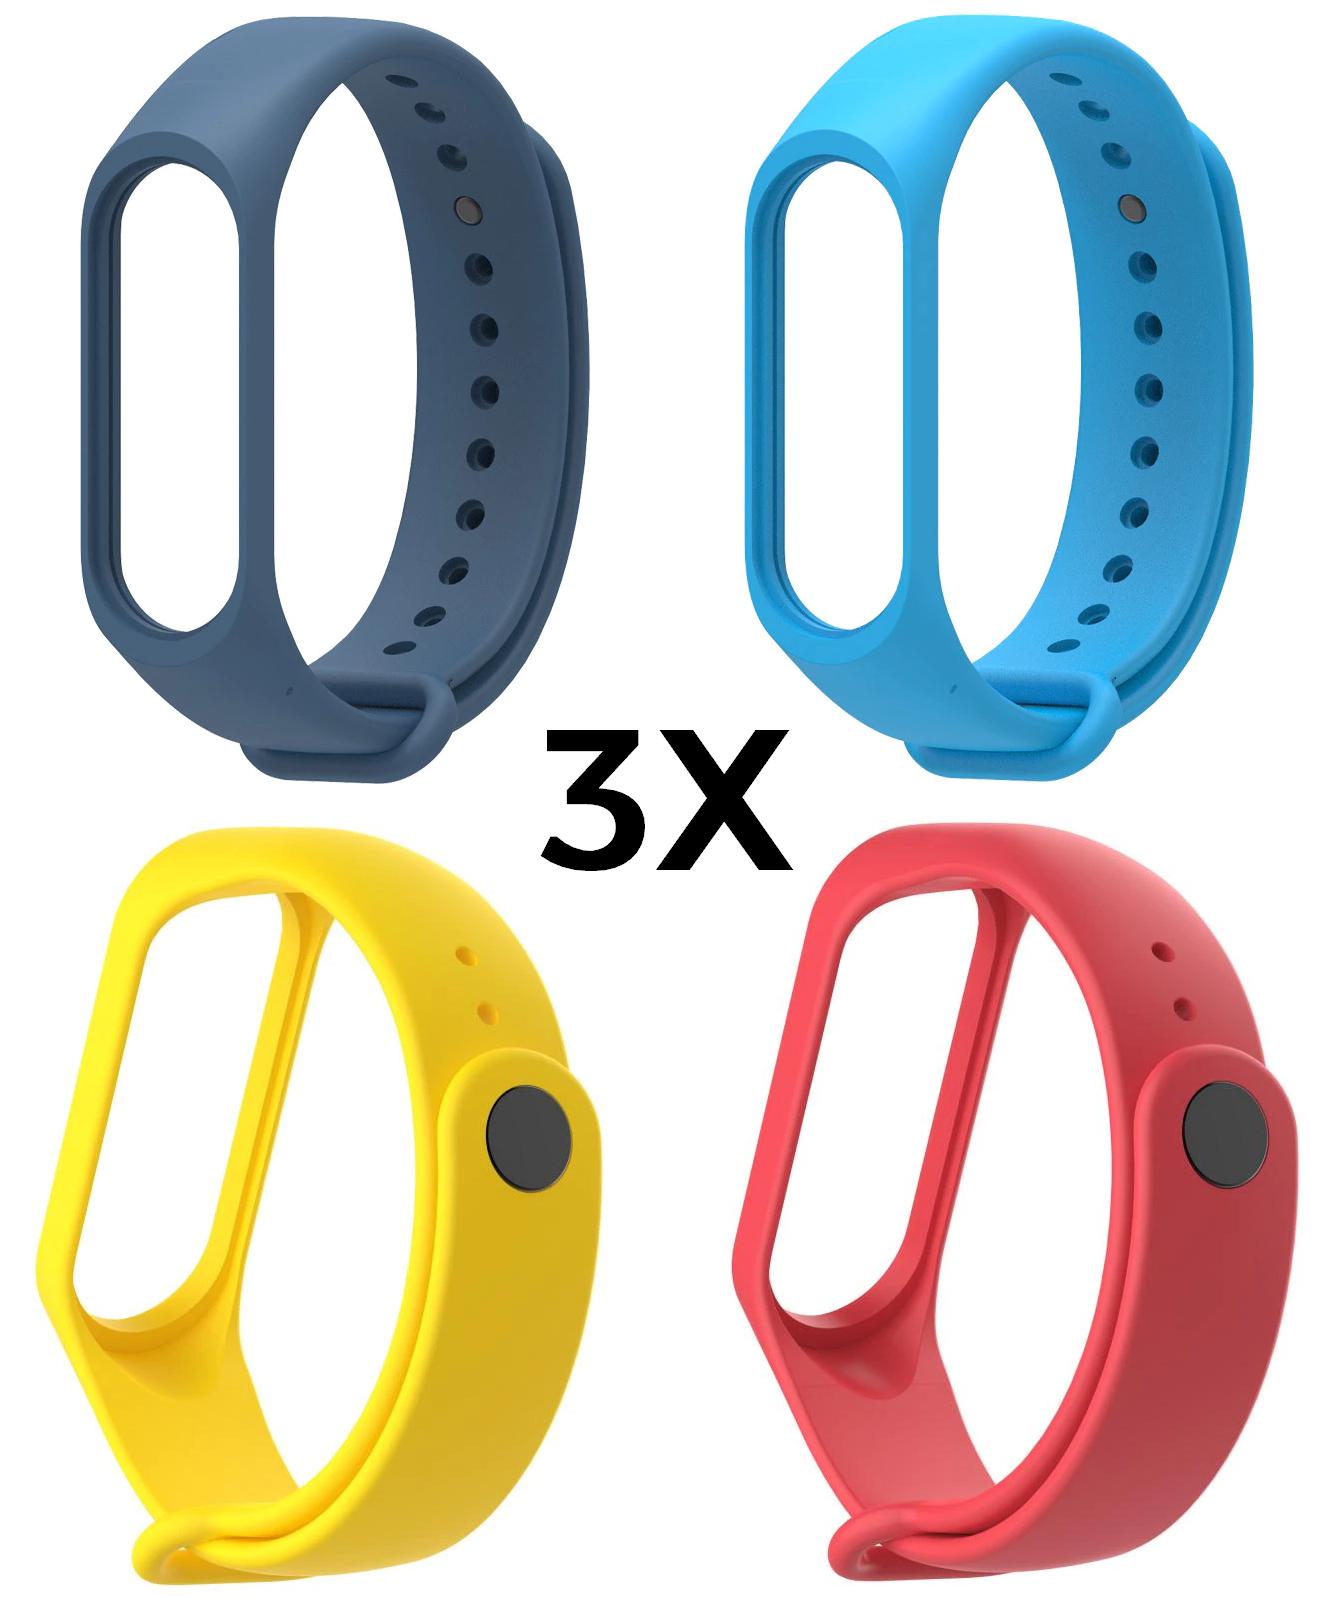 3x pulseras MiBand 4-5 solo 0.1€